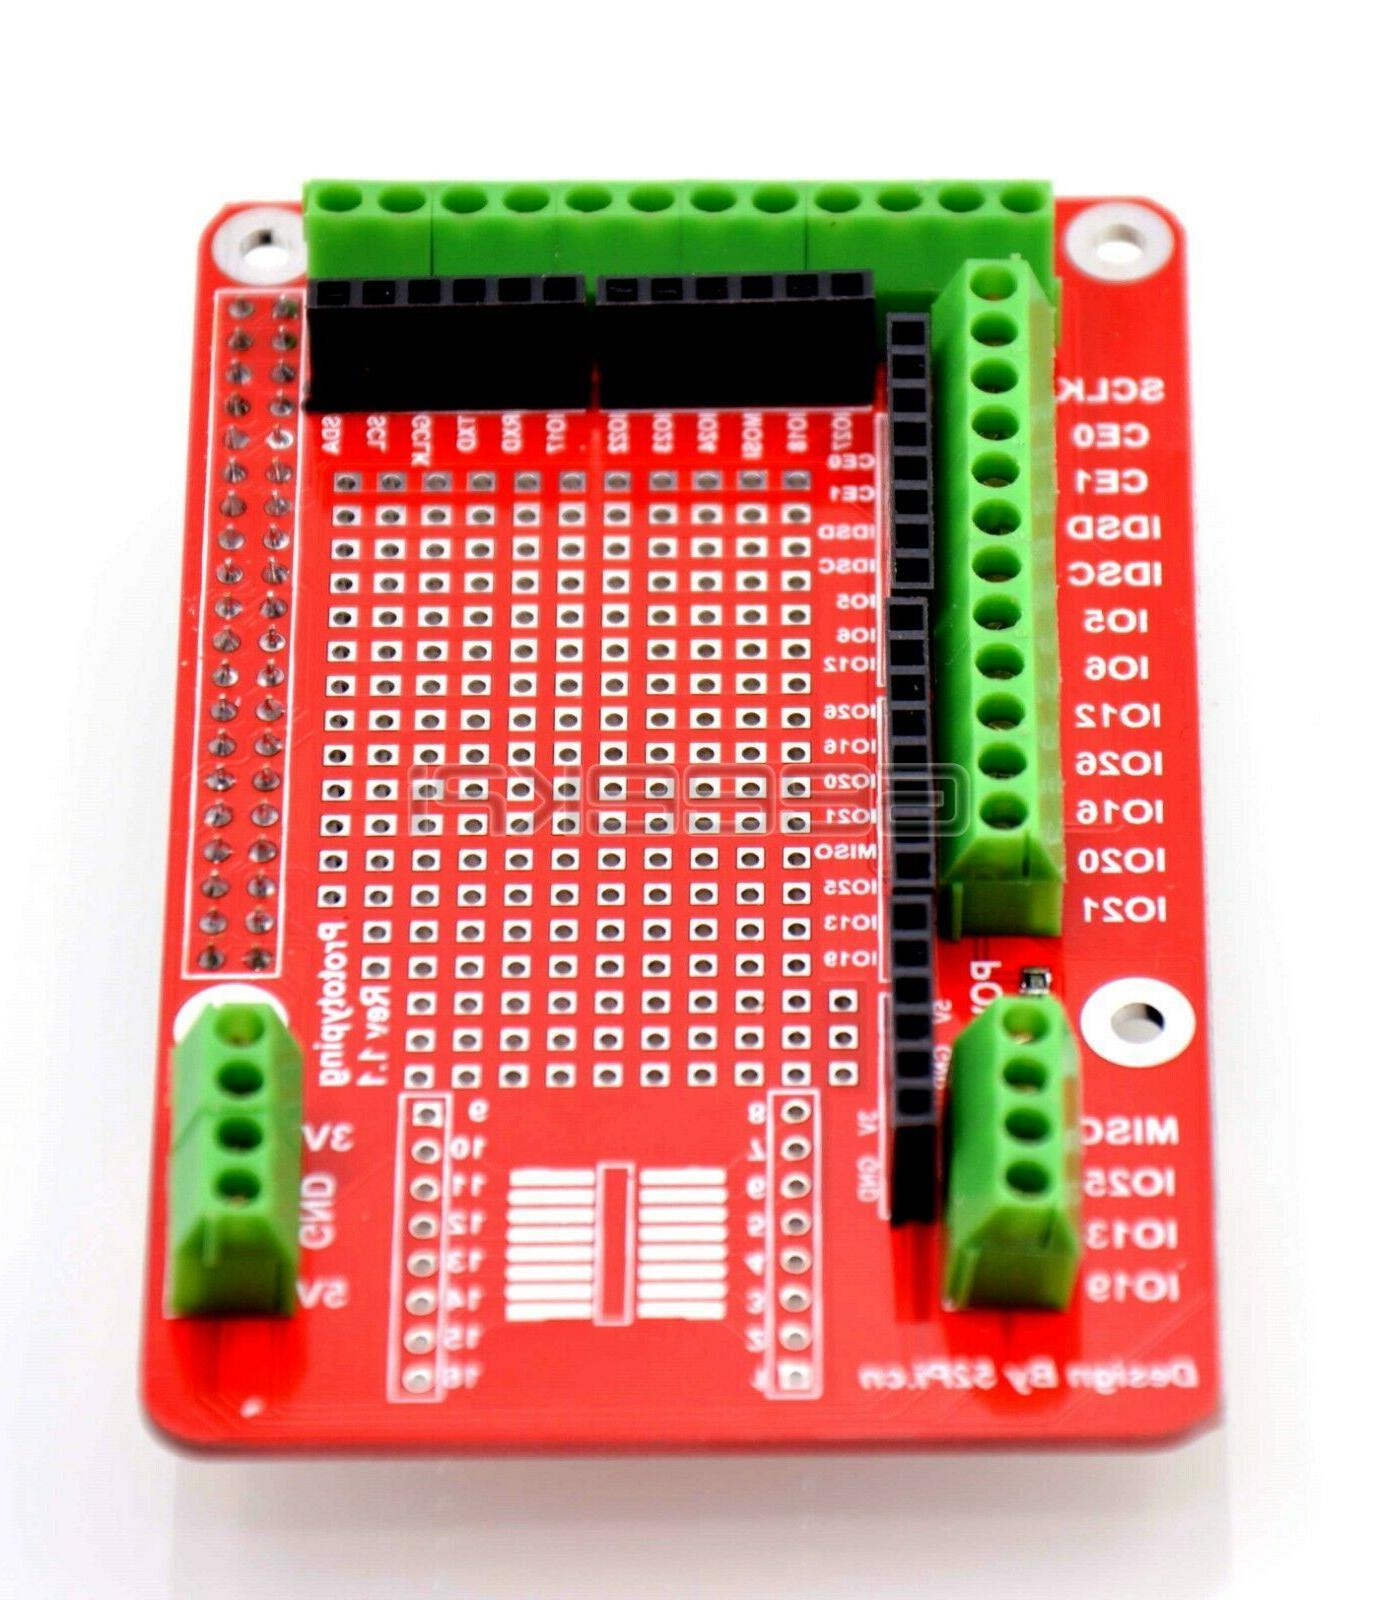 Raspberry 3B prototype Pi board Pi